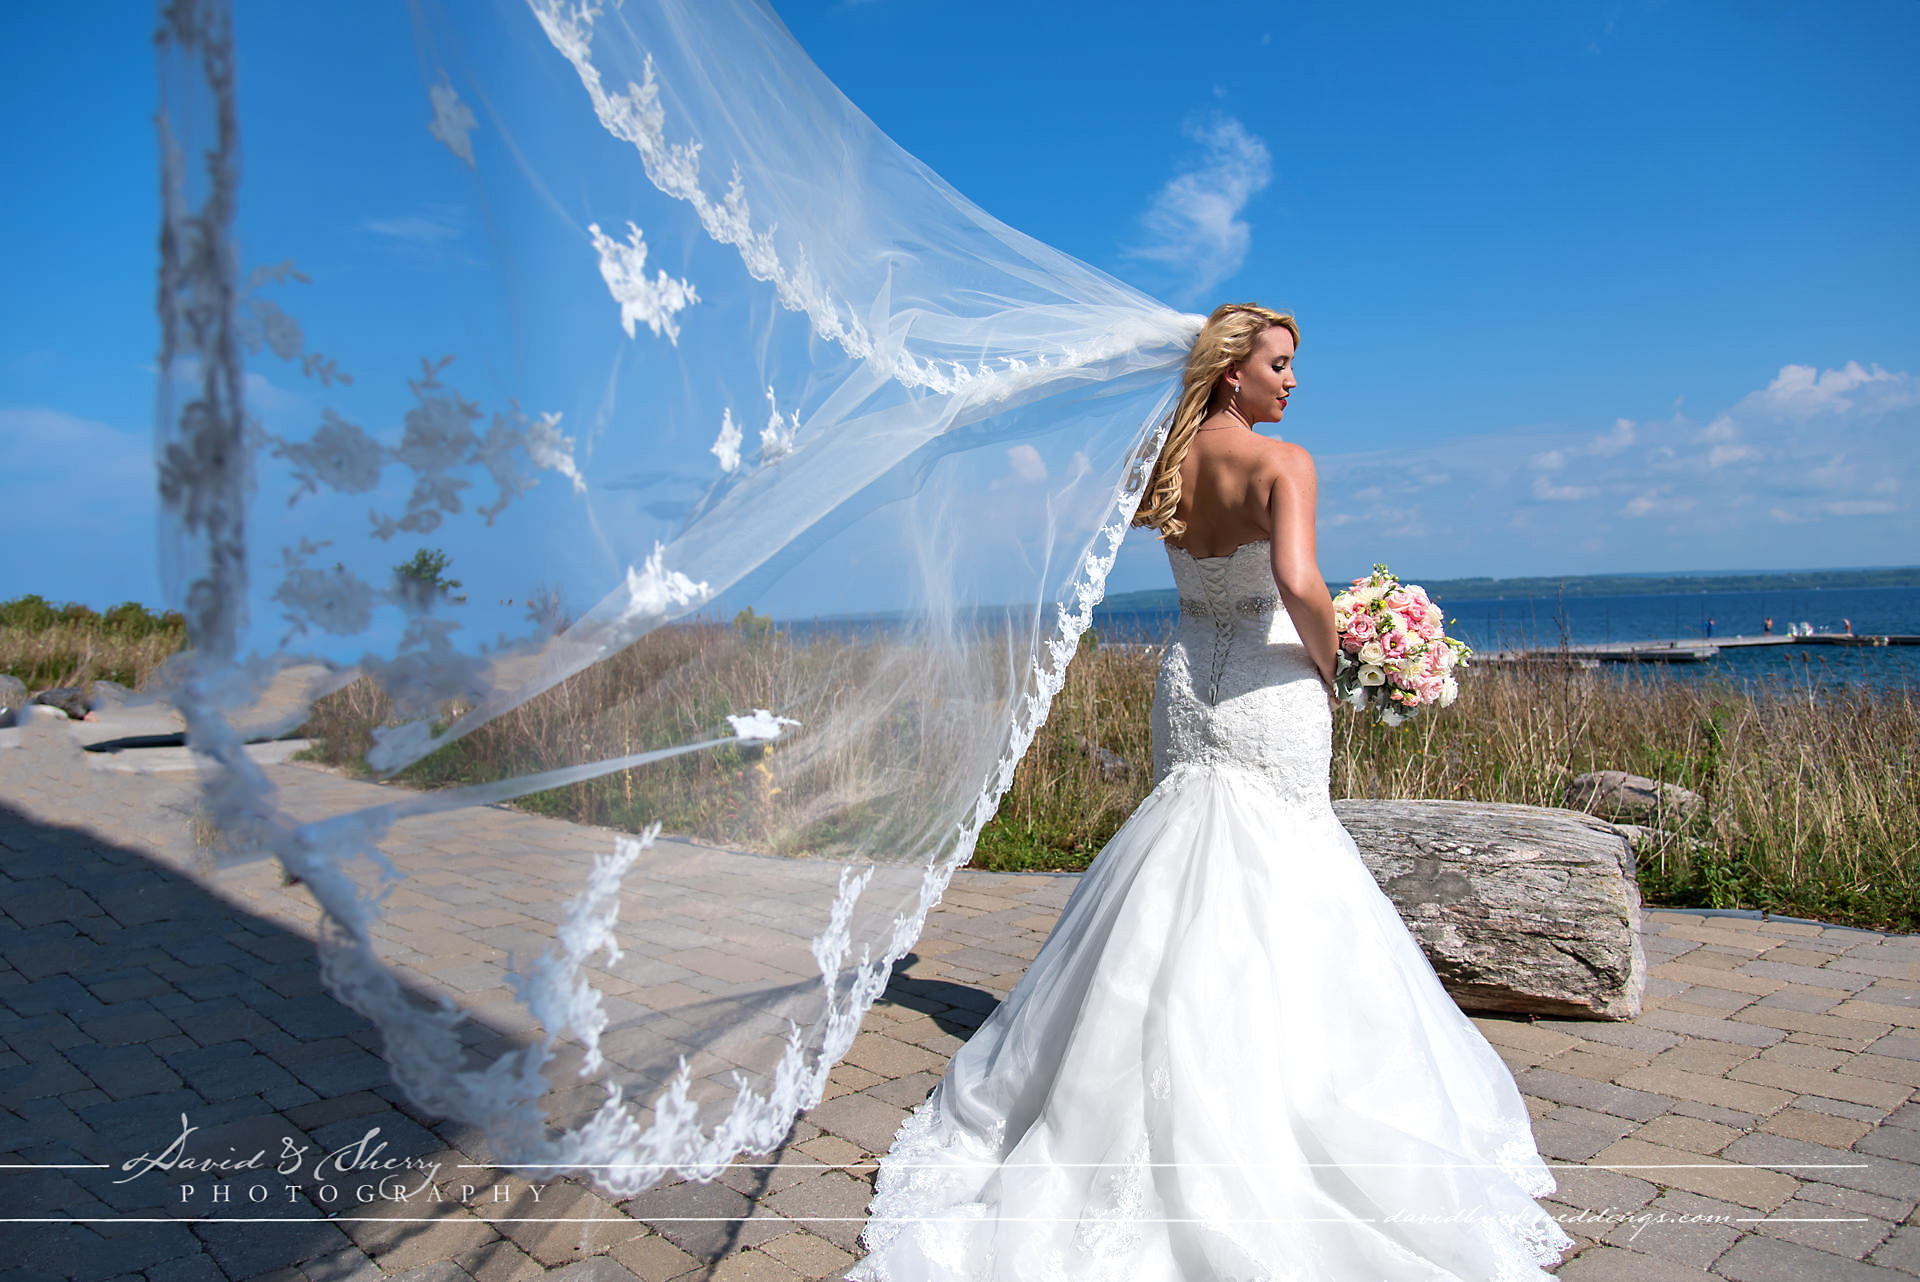 Cobble_Beach_Wedding_Photography_015